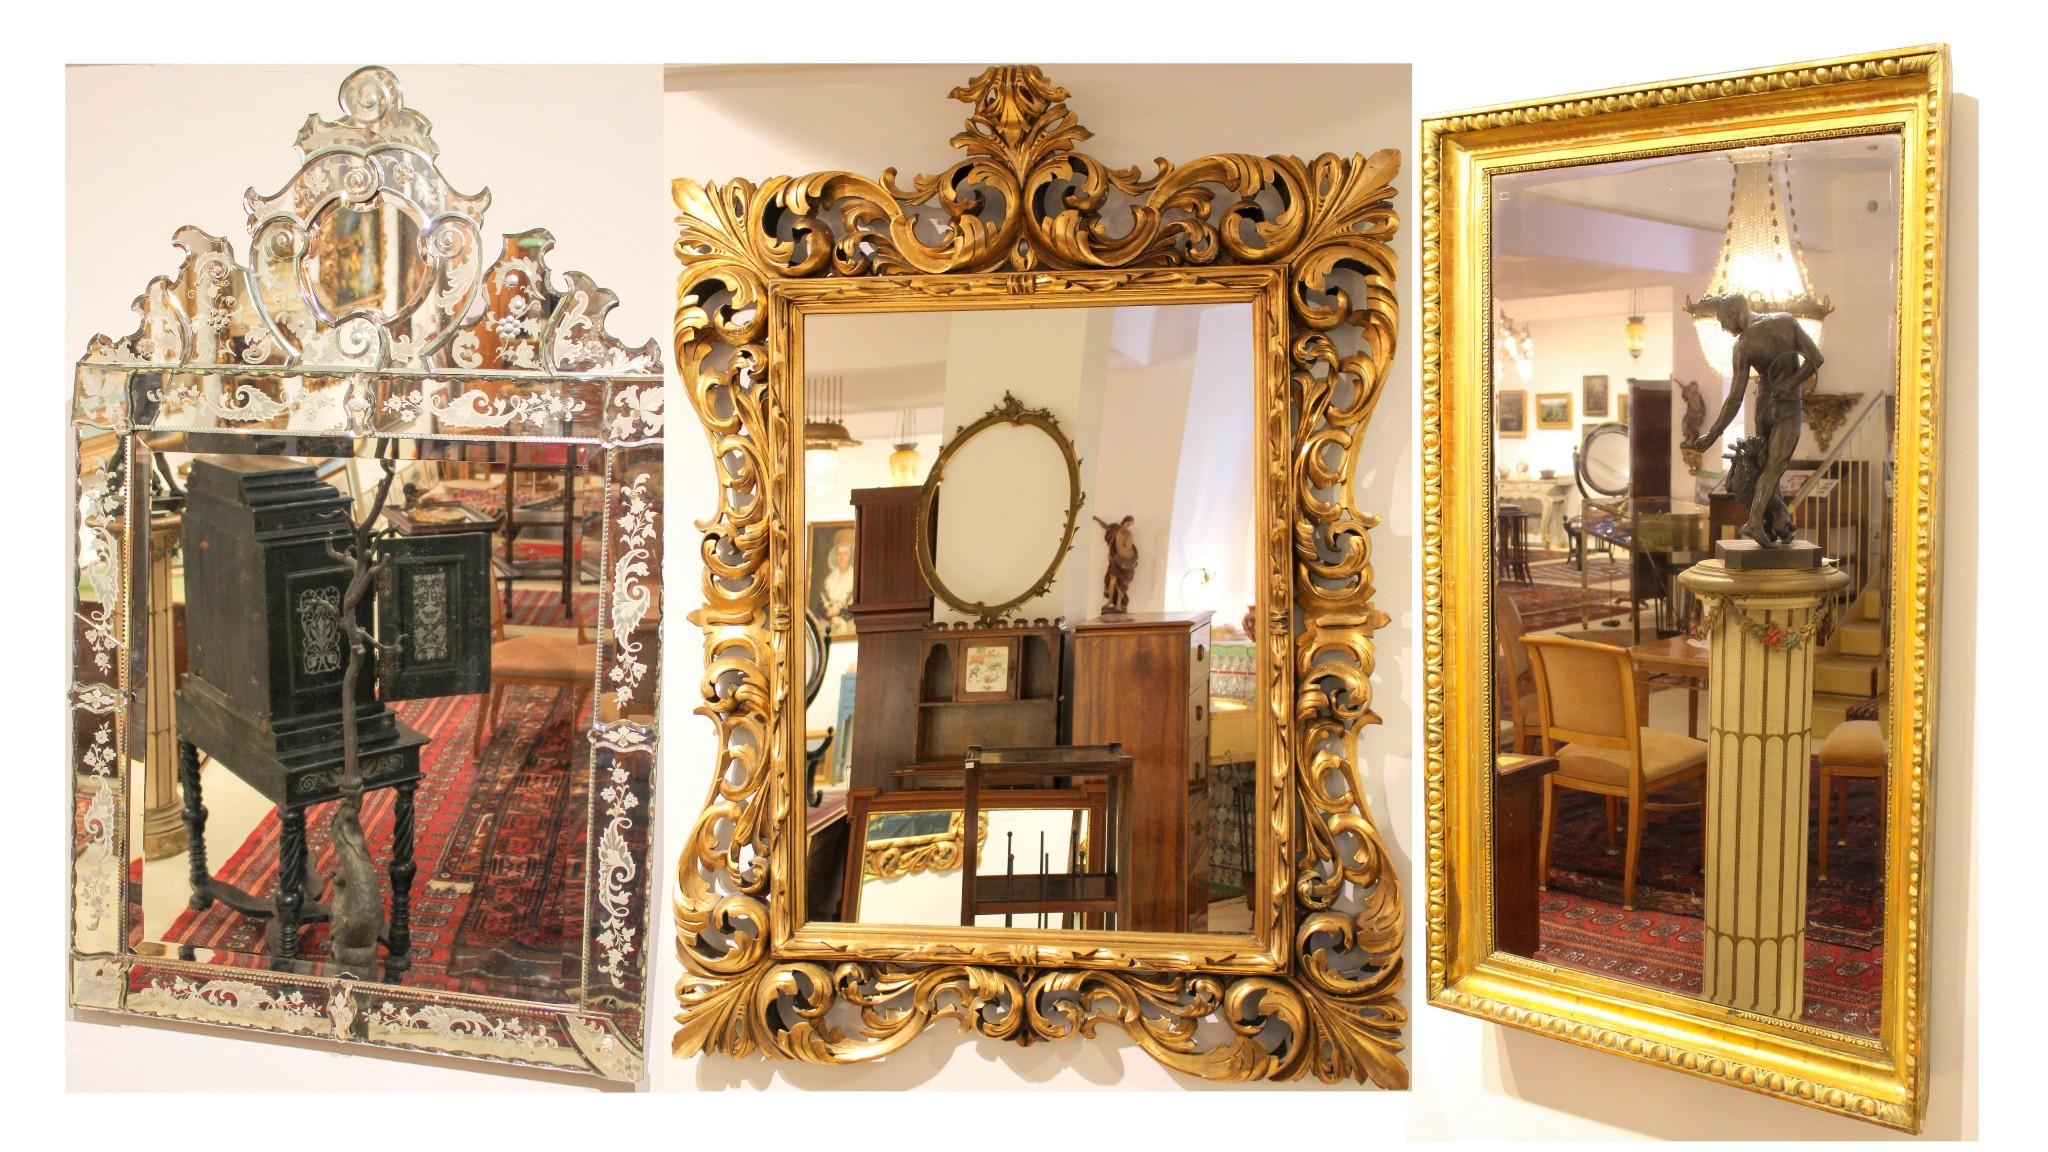 gro e auswahl an spiegel bei apfel antik apfel antik. Black Bedroom Furniture Sets. Home Design Ideas